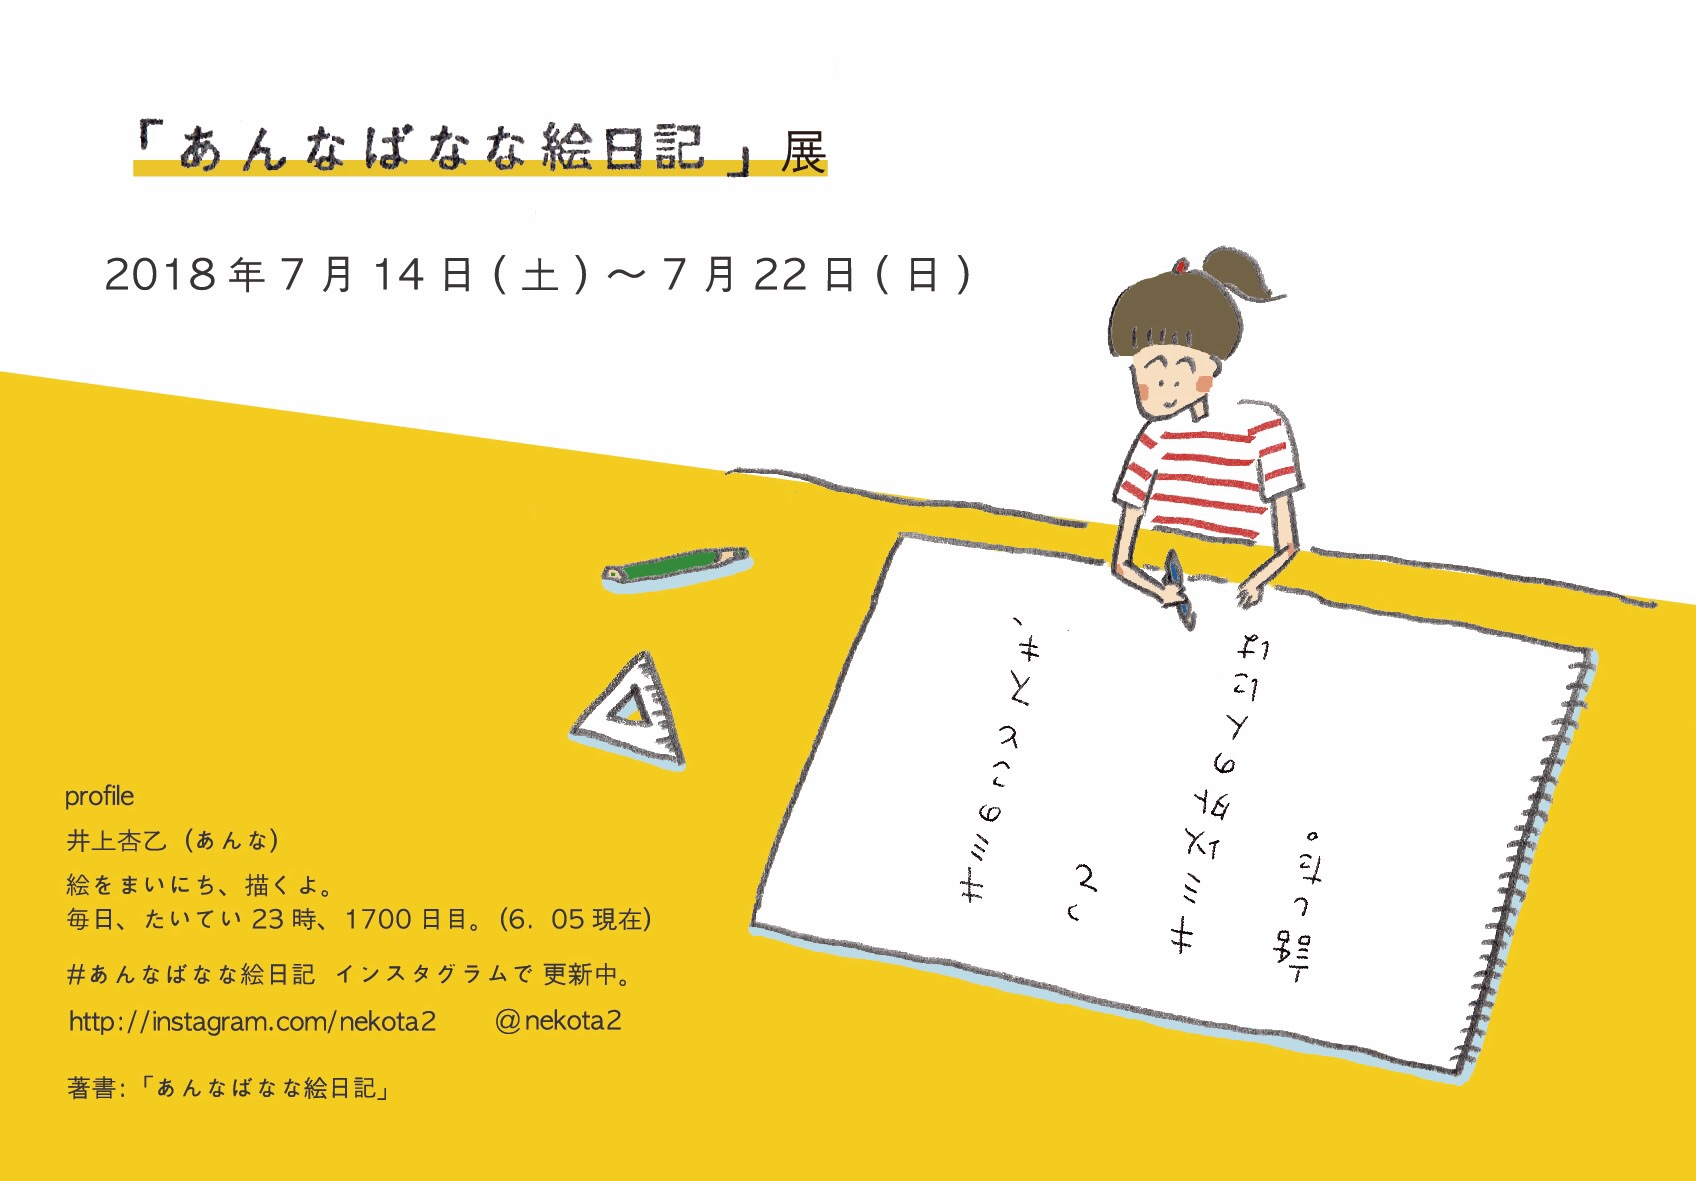 Galerie de RIVIERE展示情報 井上杏乙「あんなばなな絵日記」展 2018.7.14 SAT - 7.24  SUN